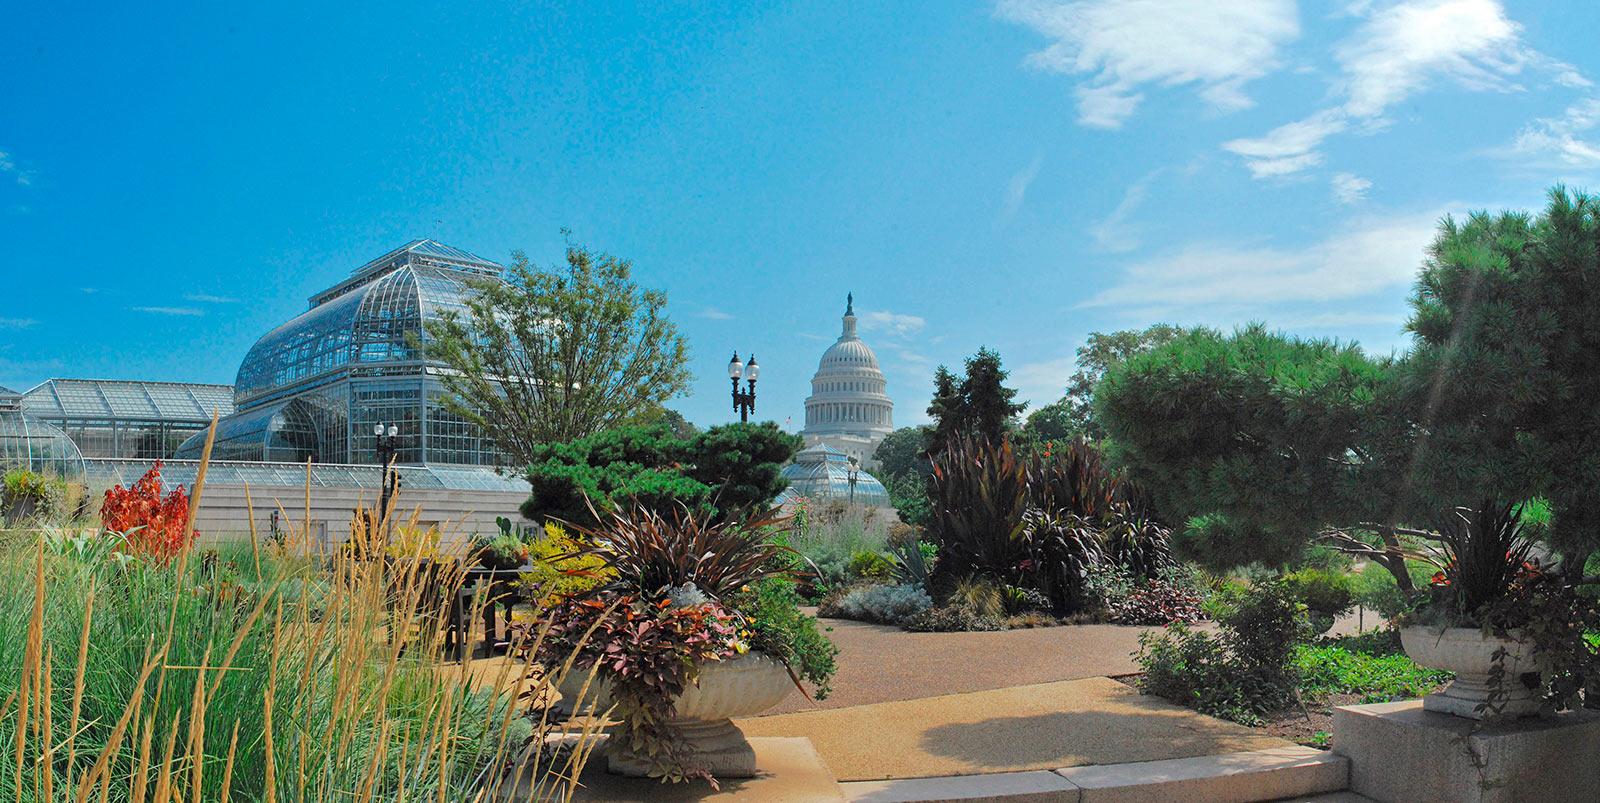 12 Inspiring Public Parks Gardens In Washington Dc